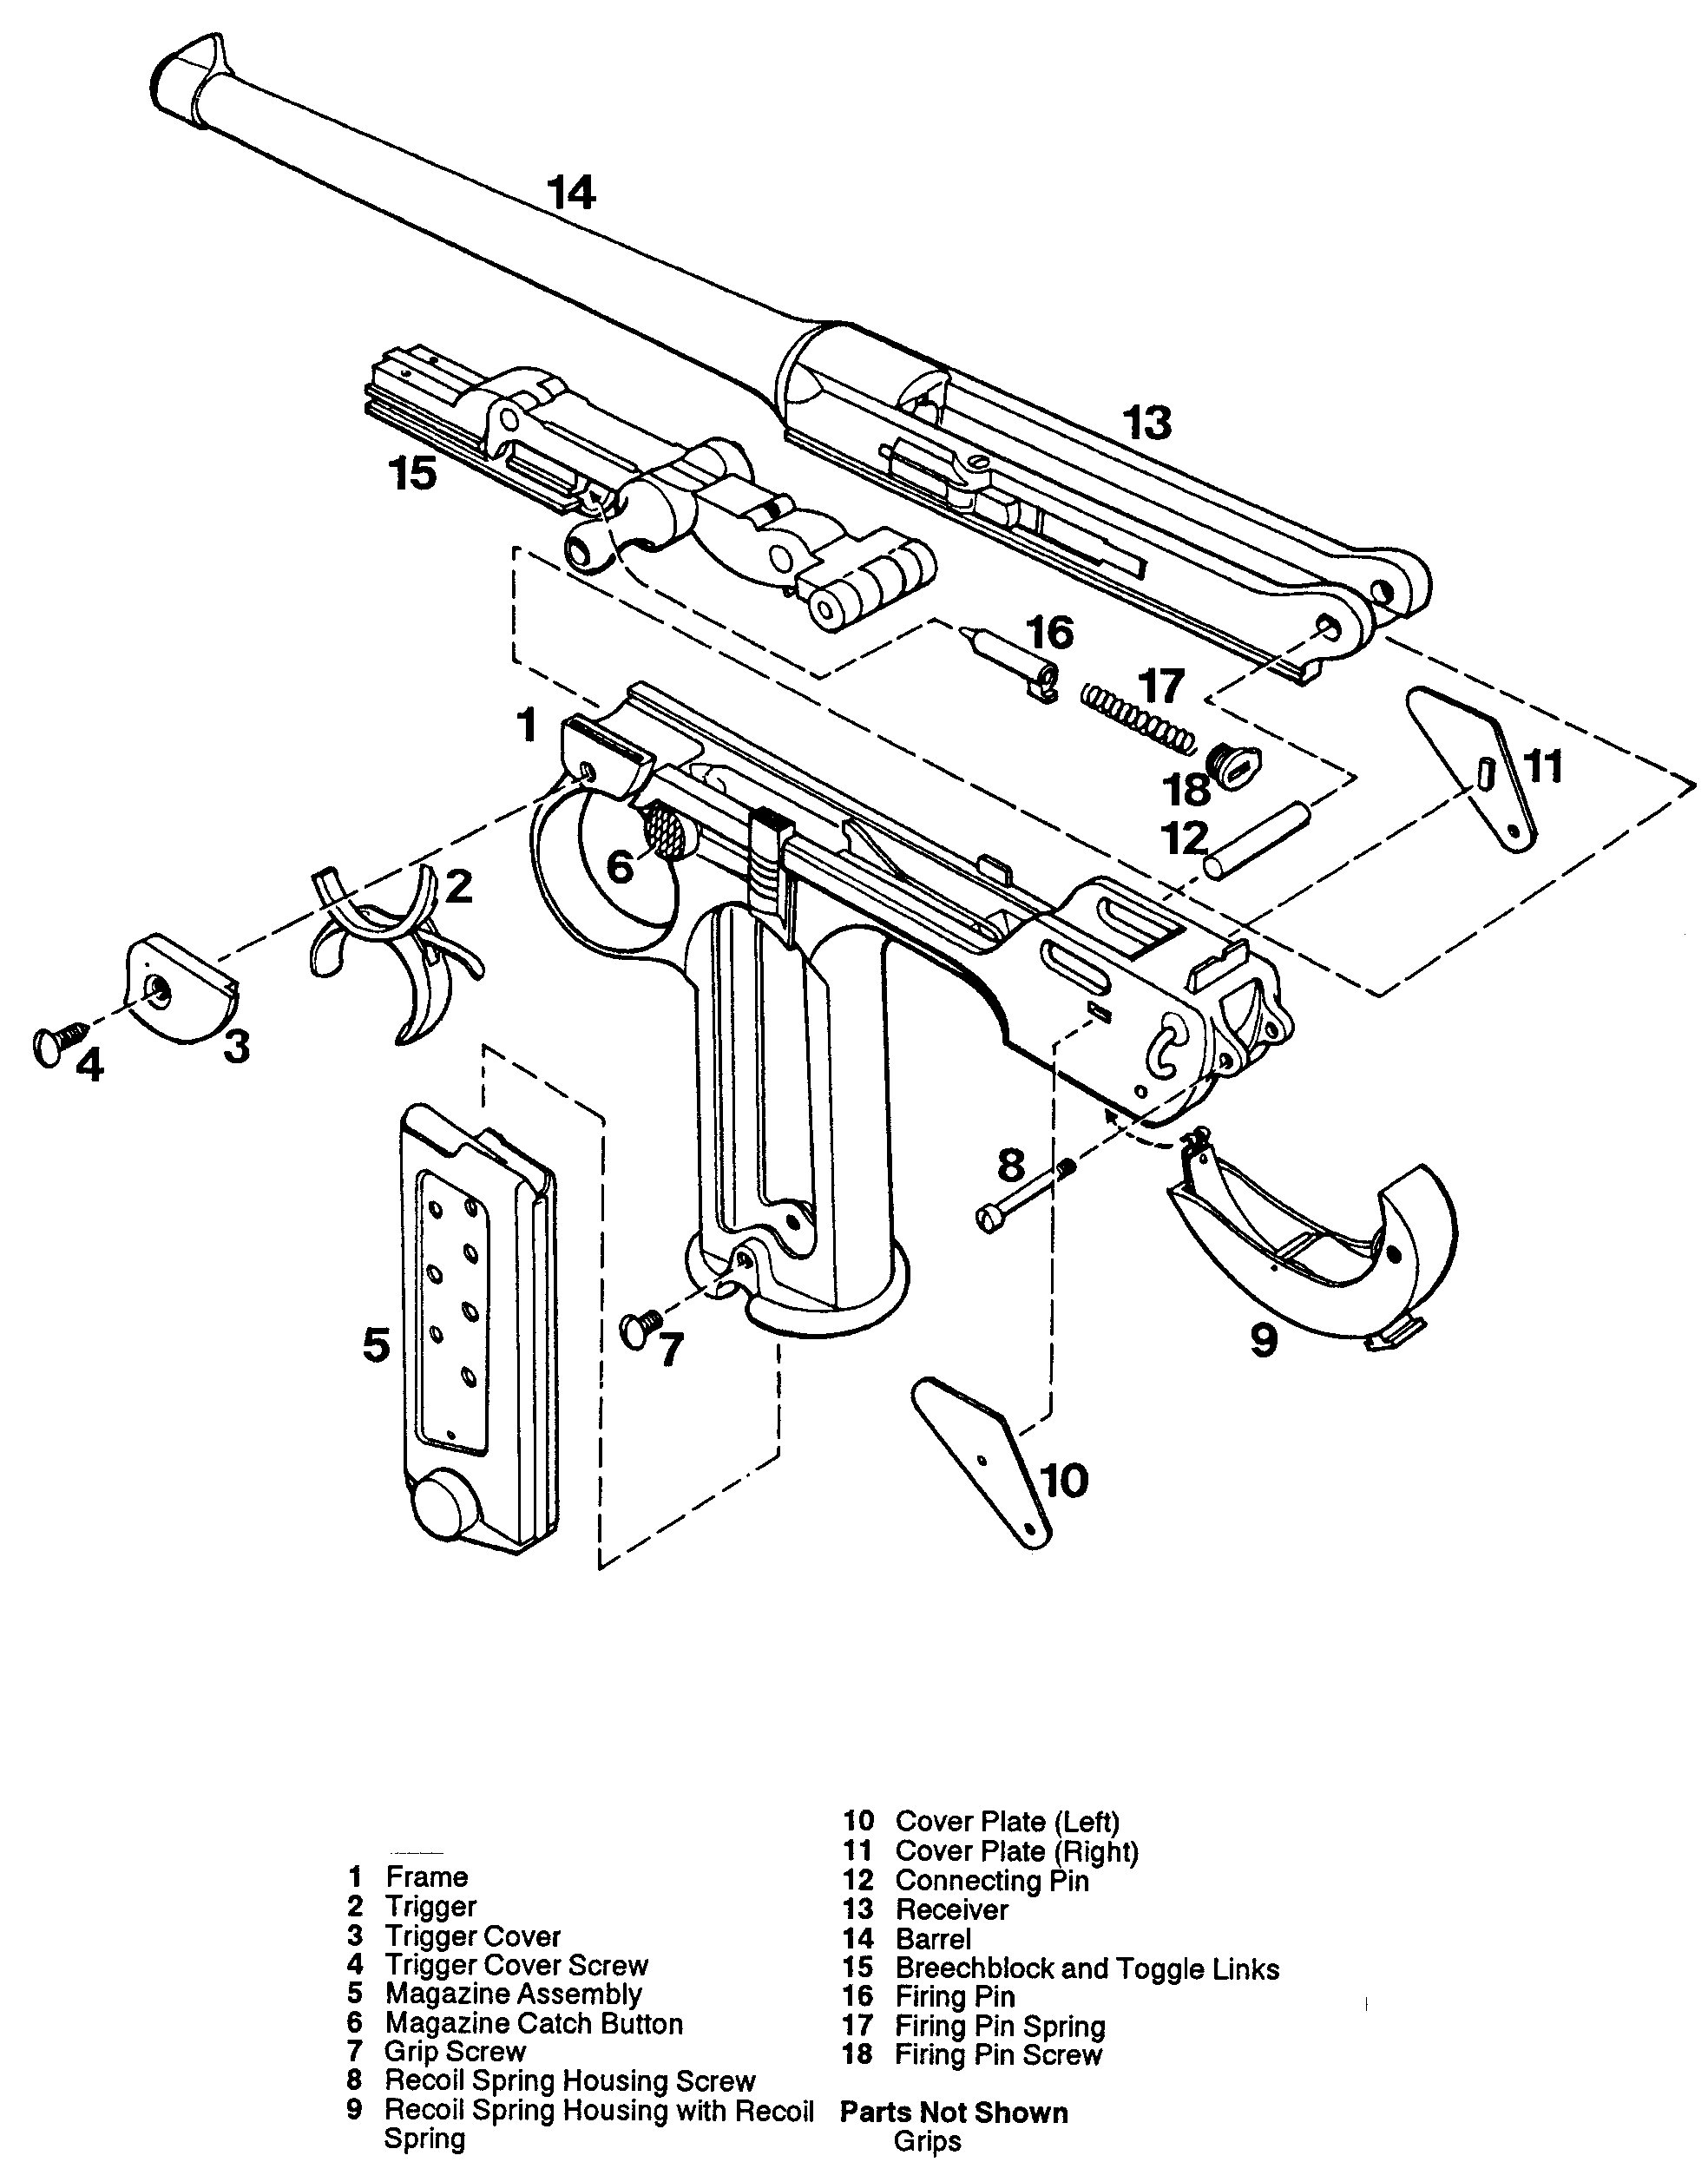 Drawn pistol blueprint Blueprint Luger for Download blueprint